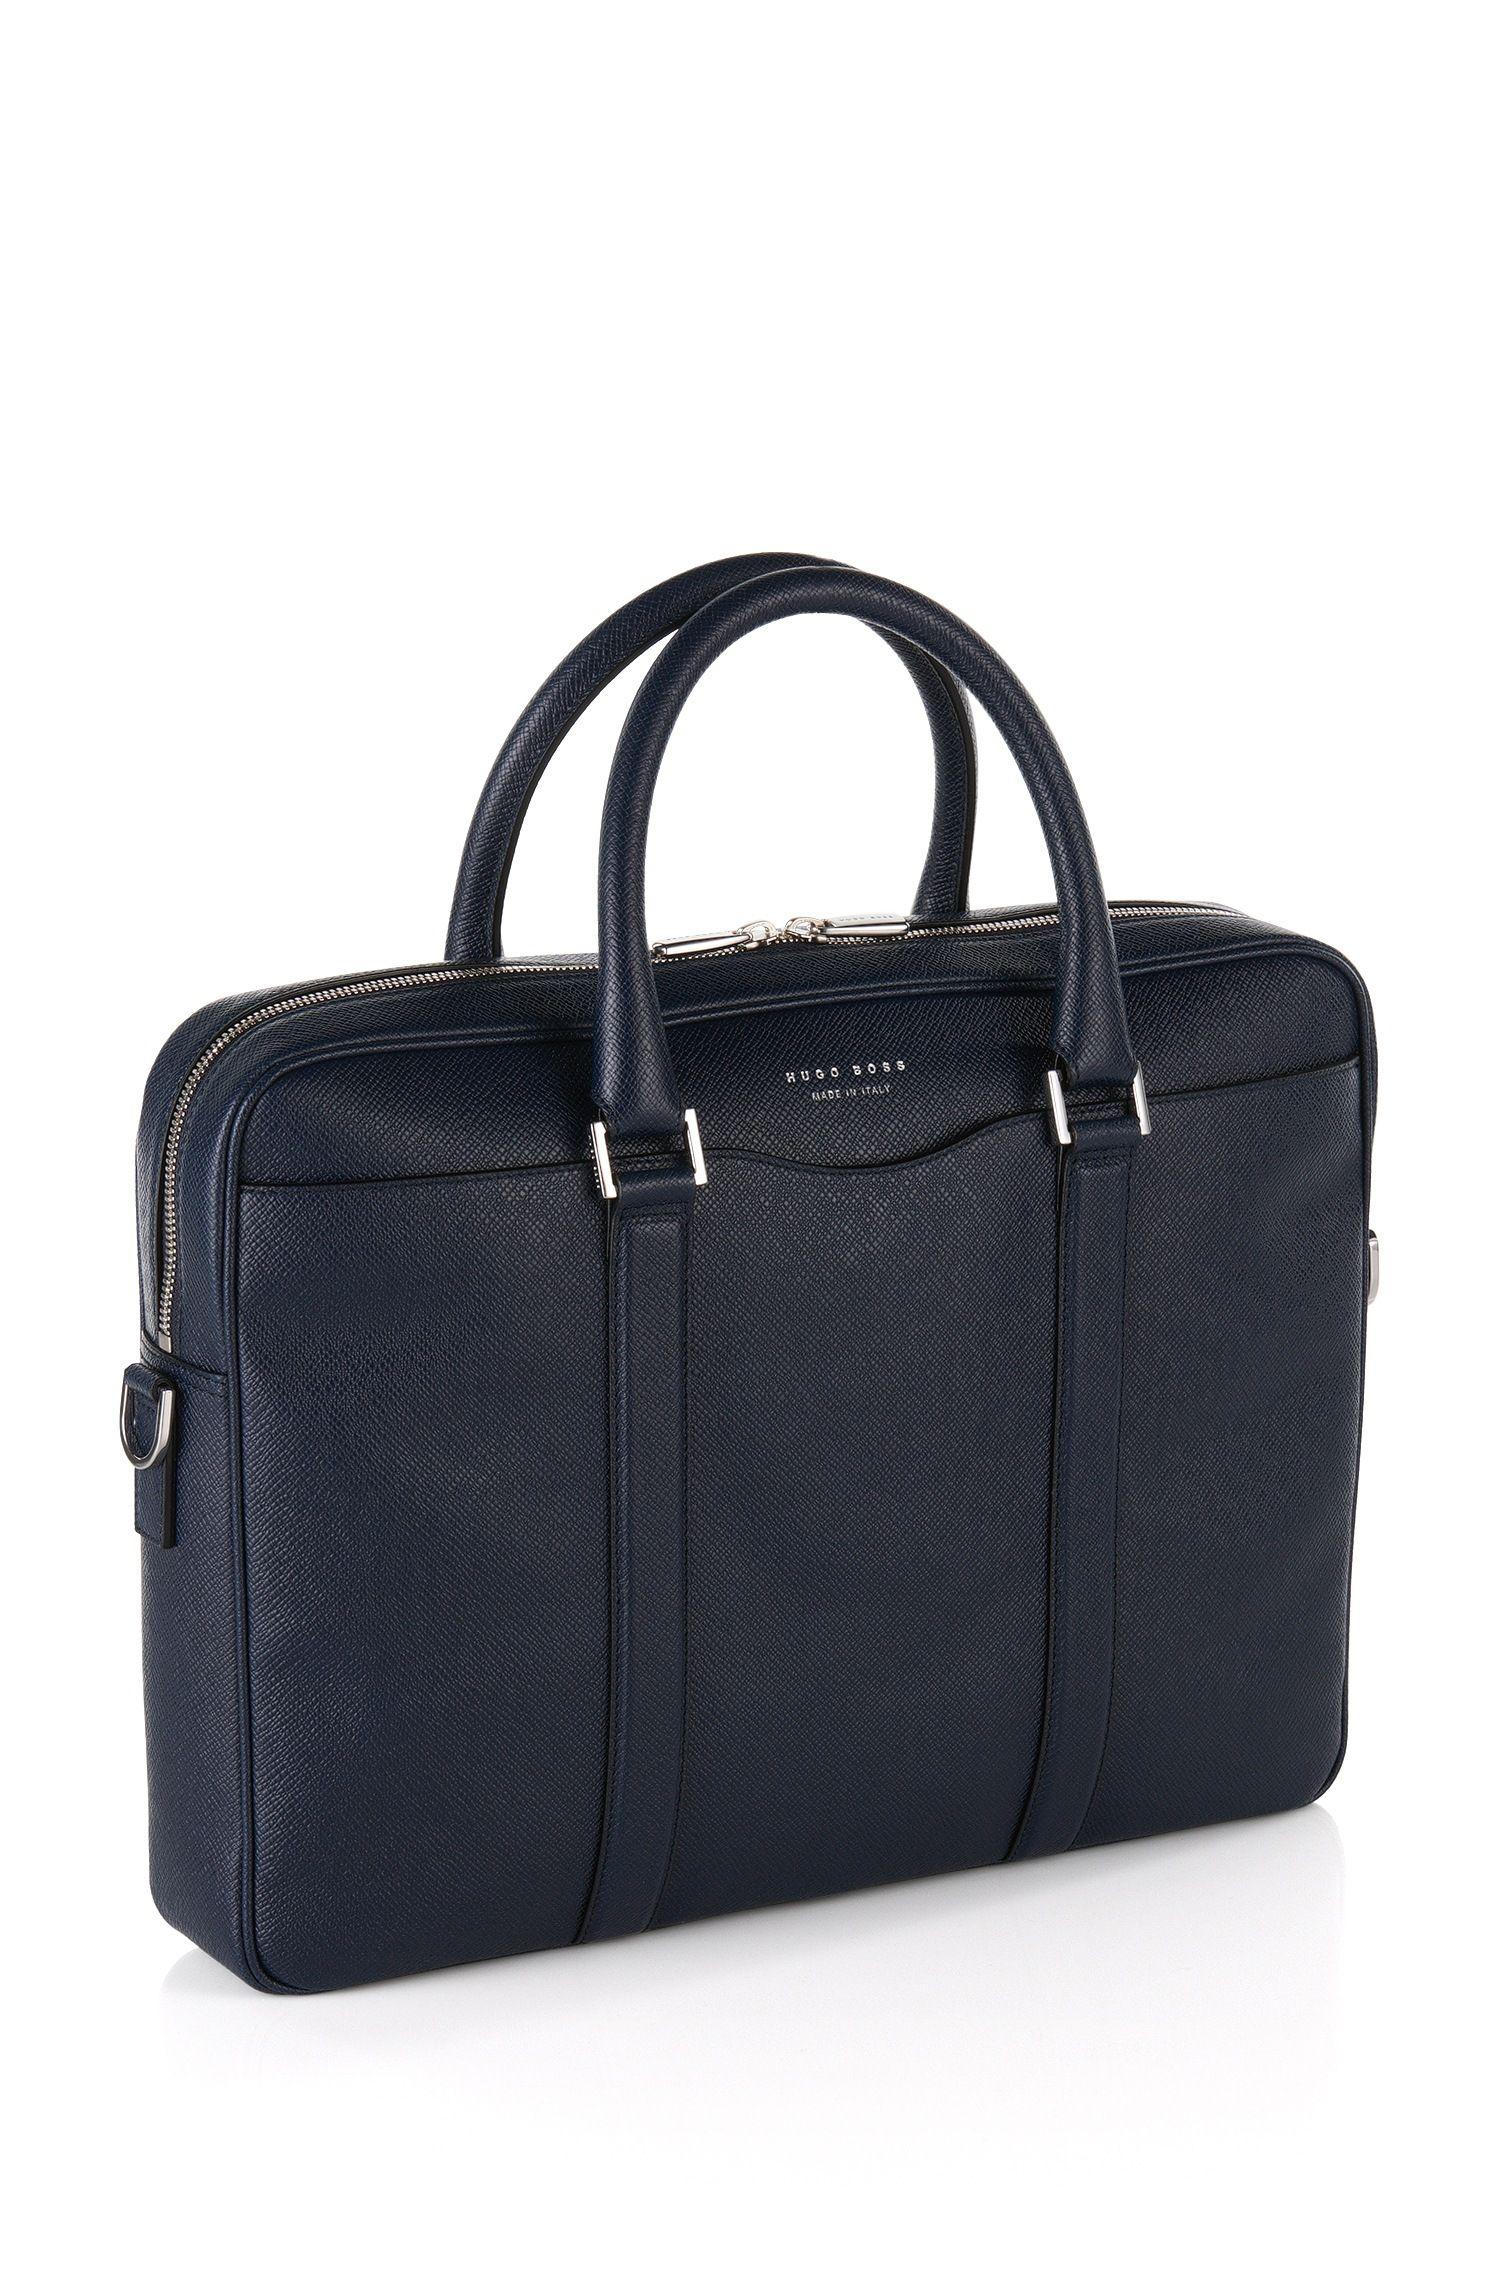 34ddfd9430 Signature Collection bag in palmellato leather